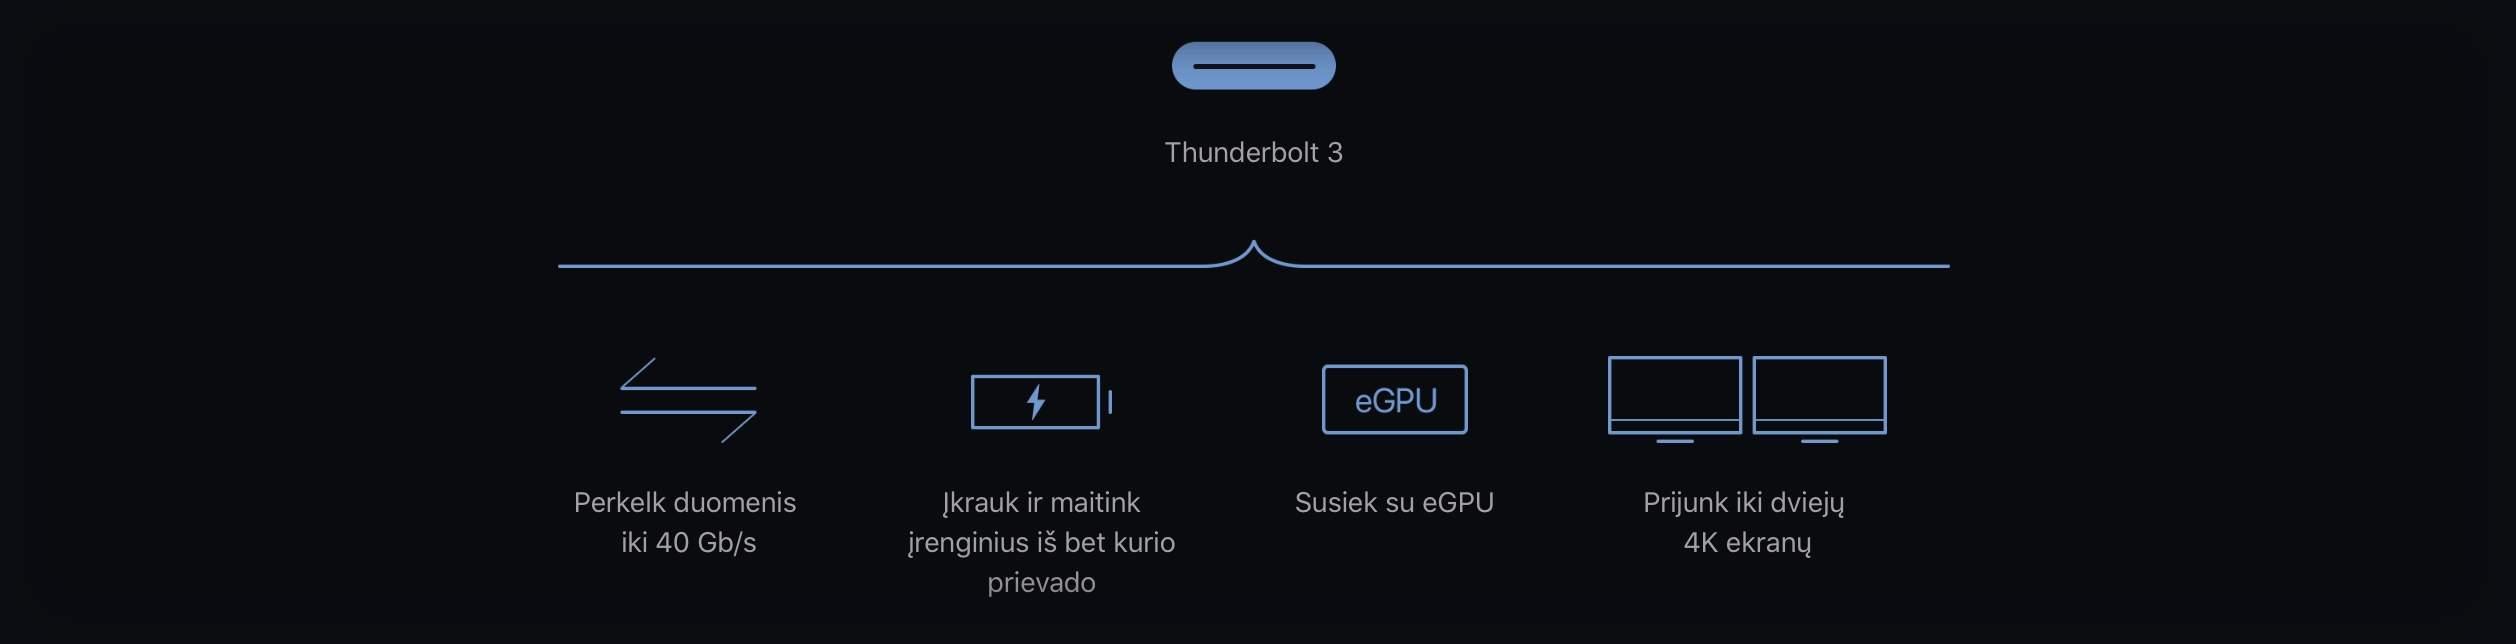 Mac mini Thunderbolt 3